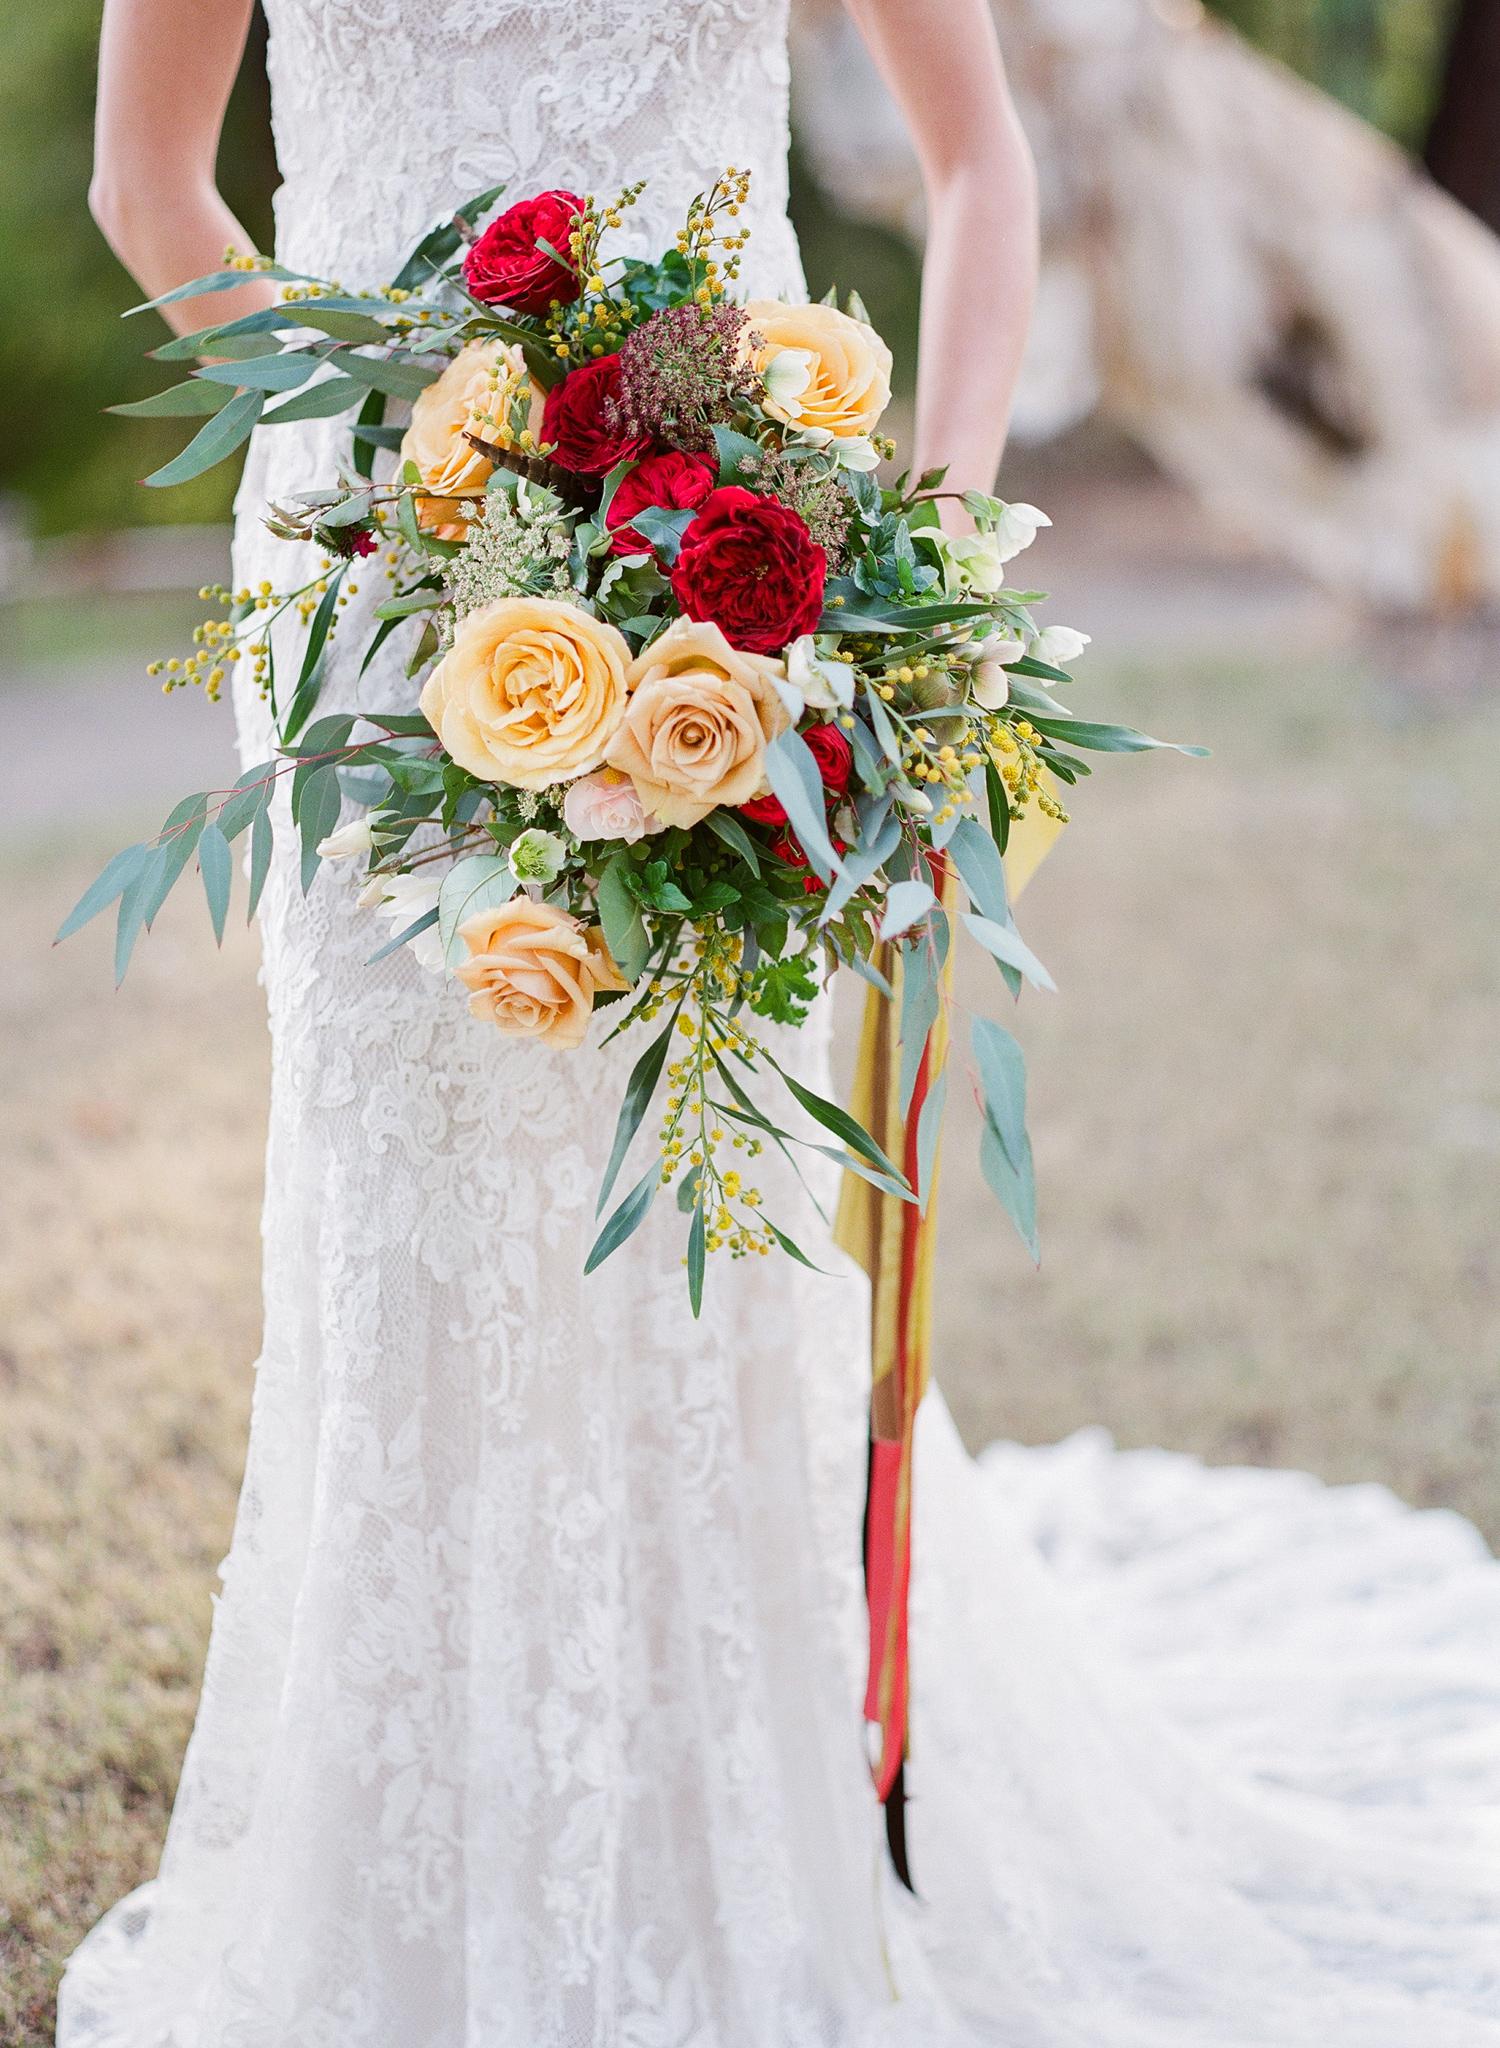 015-Jen-Wojcik-Photography-San-Diego-Wedding-Photographer.jpg